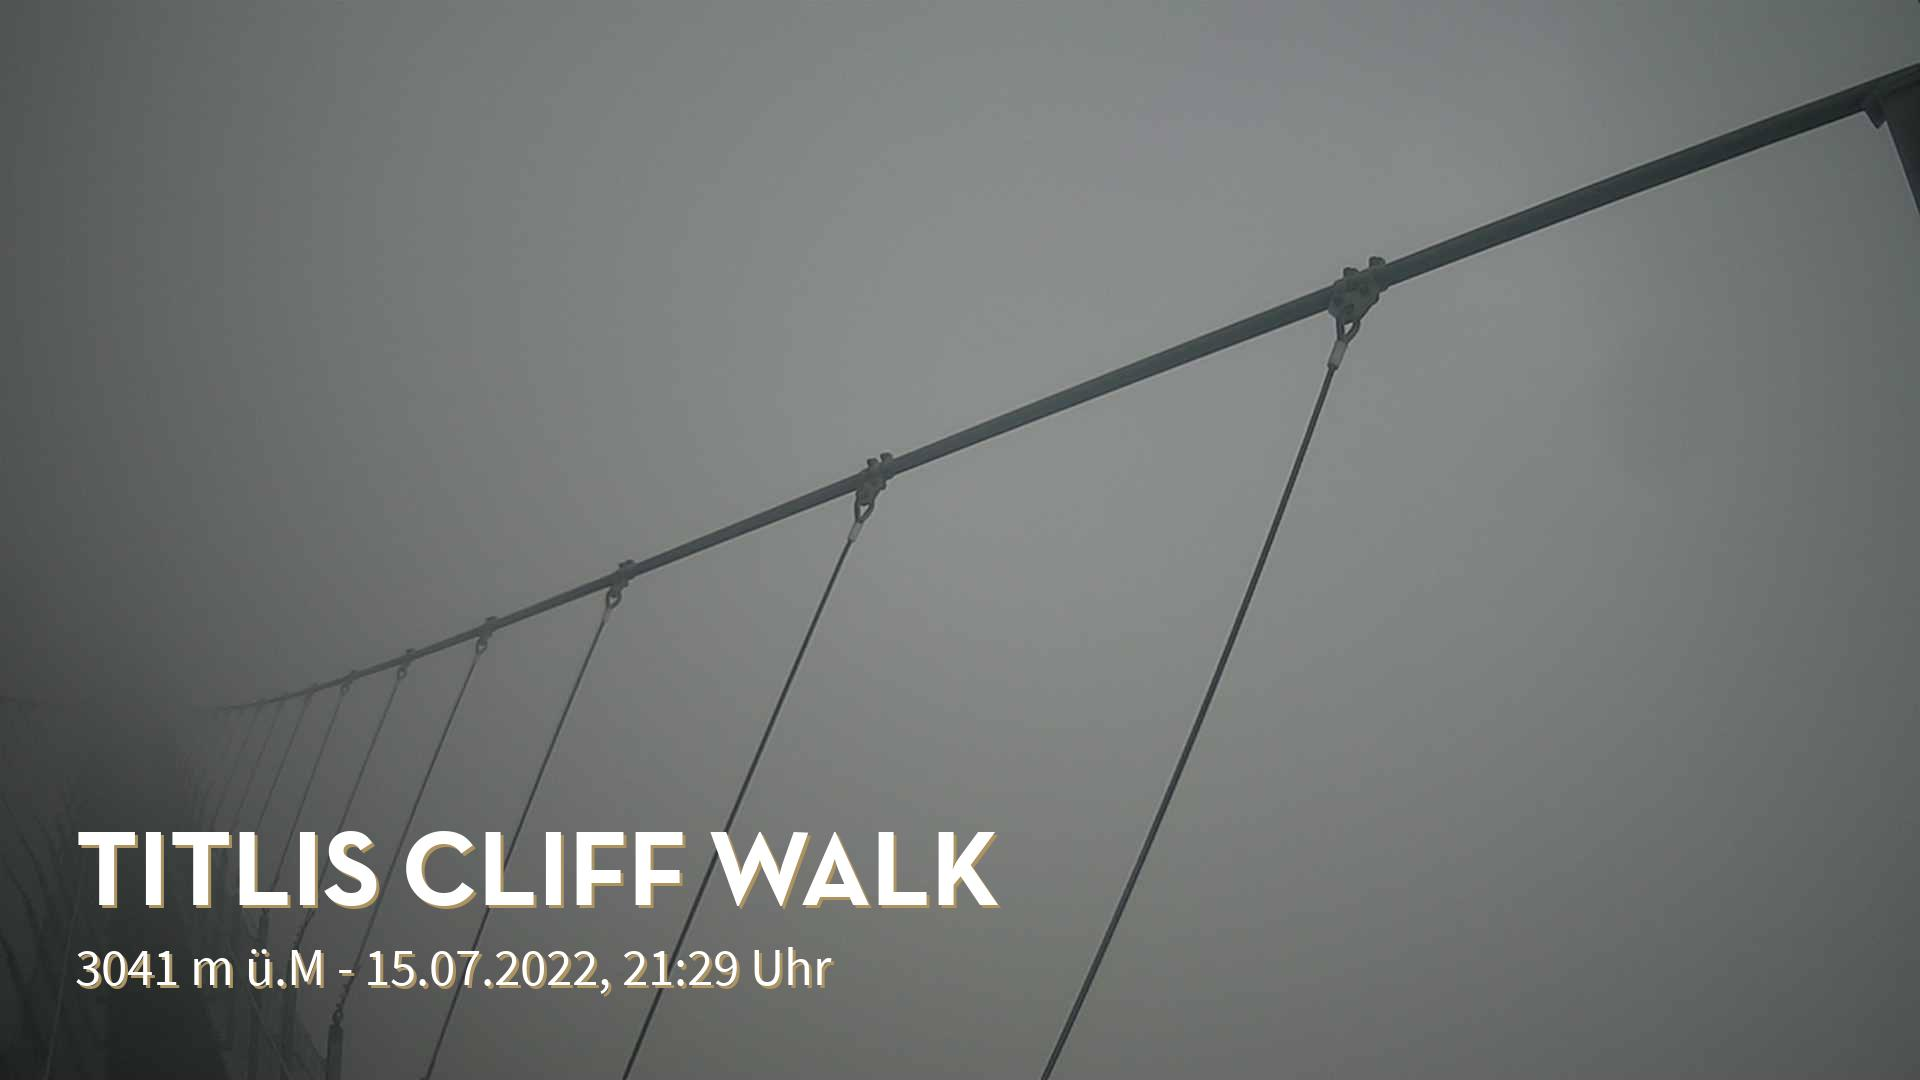 Engelberg Titlis Cliff Walk